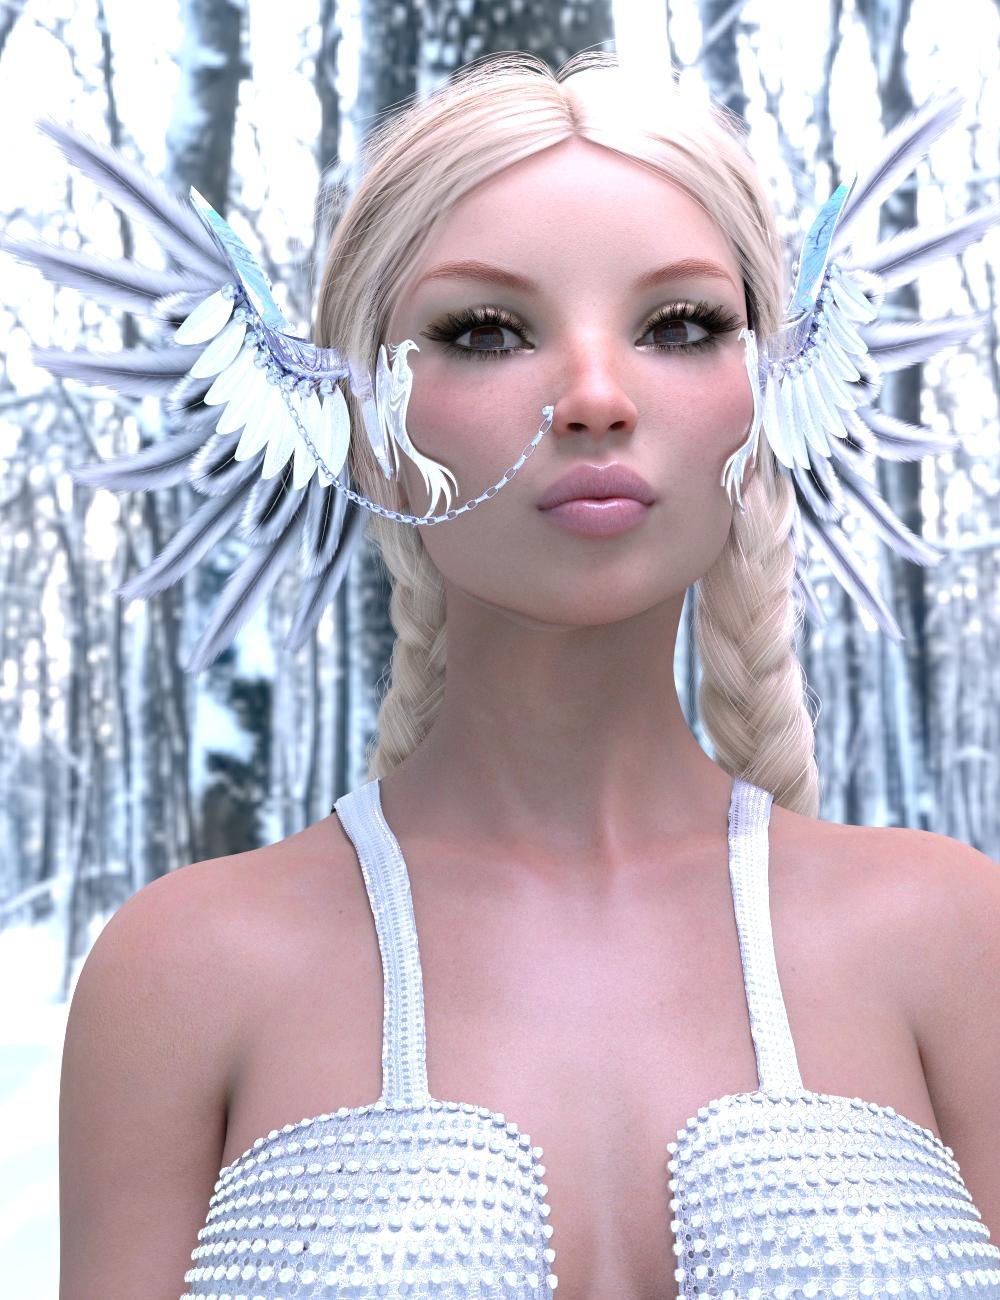 Elaborate Jewelry Vol 1 by: ParallaxCreatesParallaxCreates, 3D Models by Daz 3D